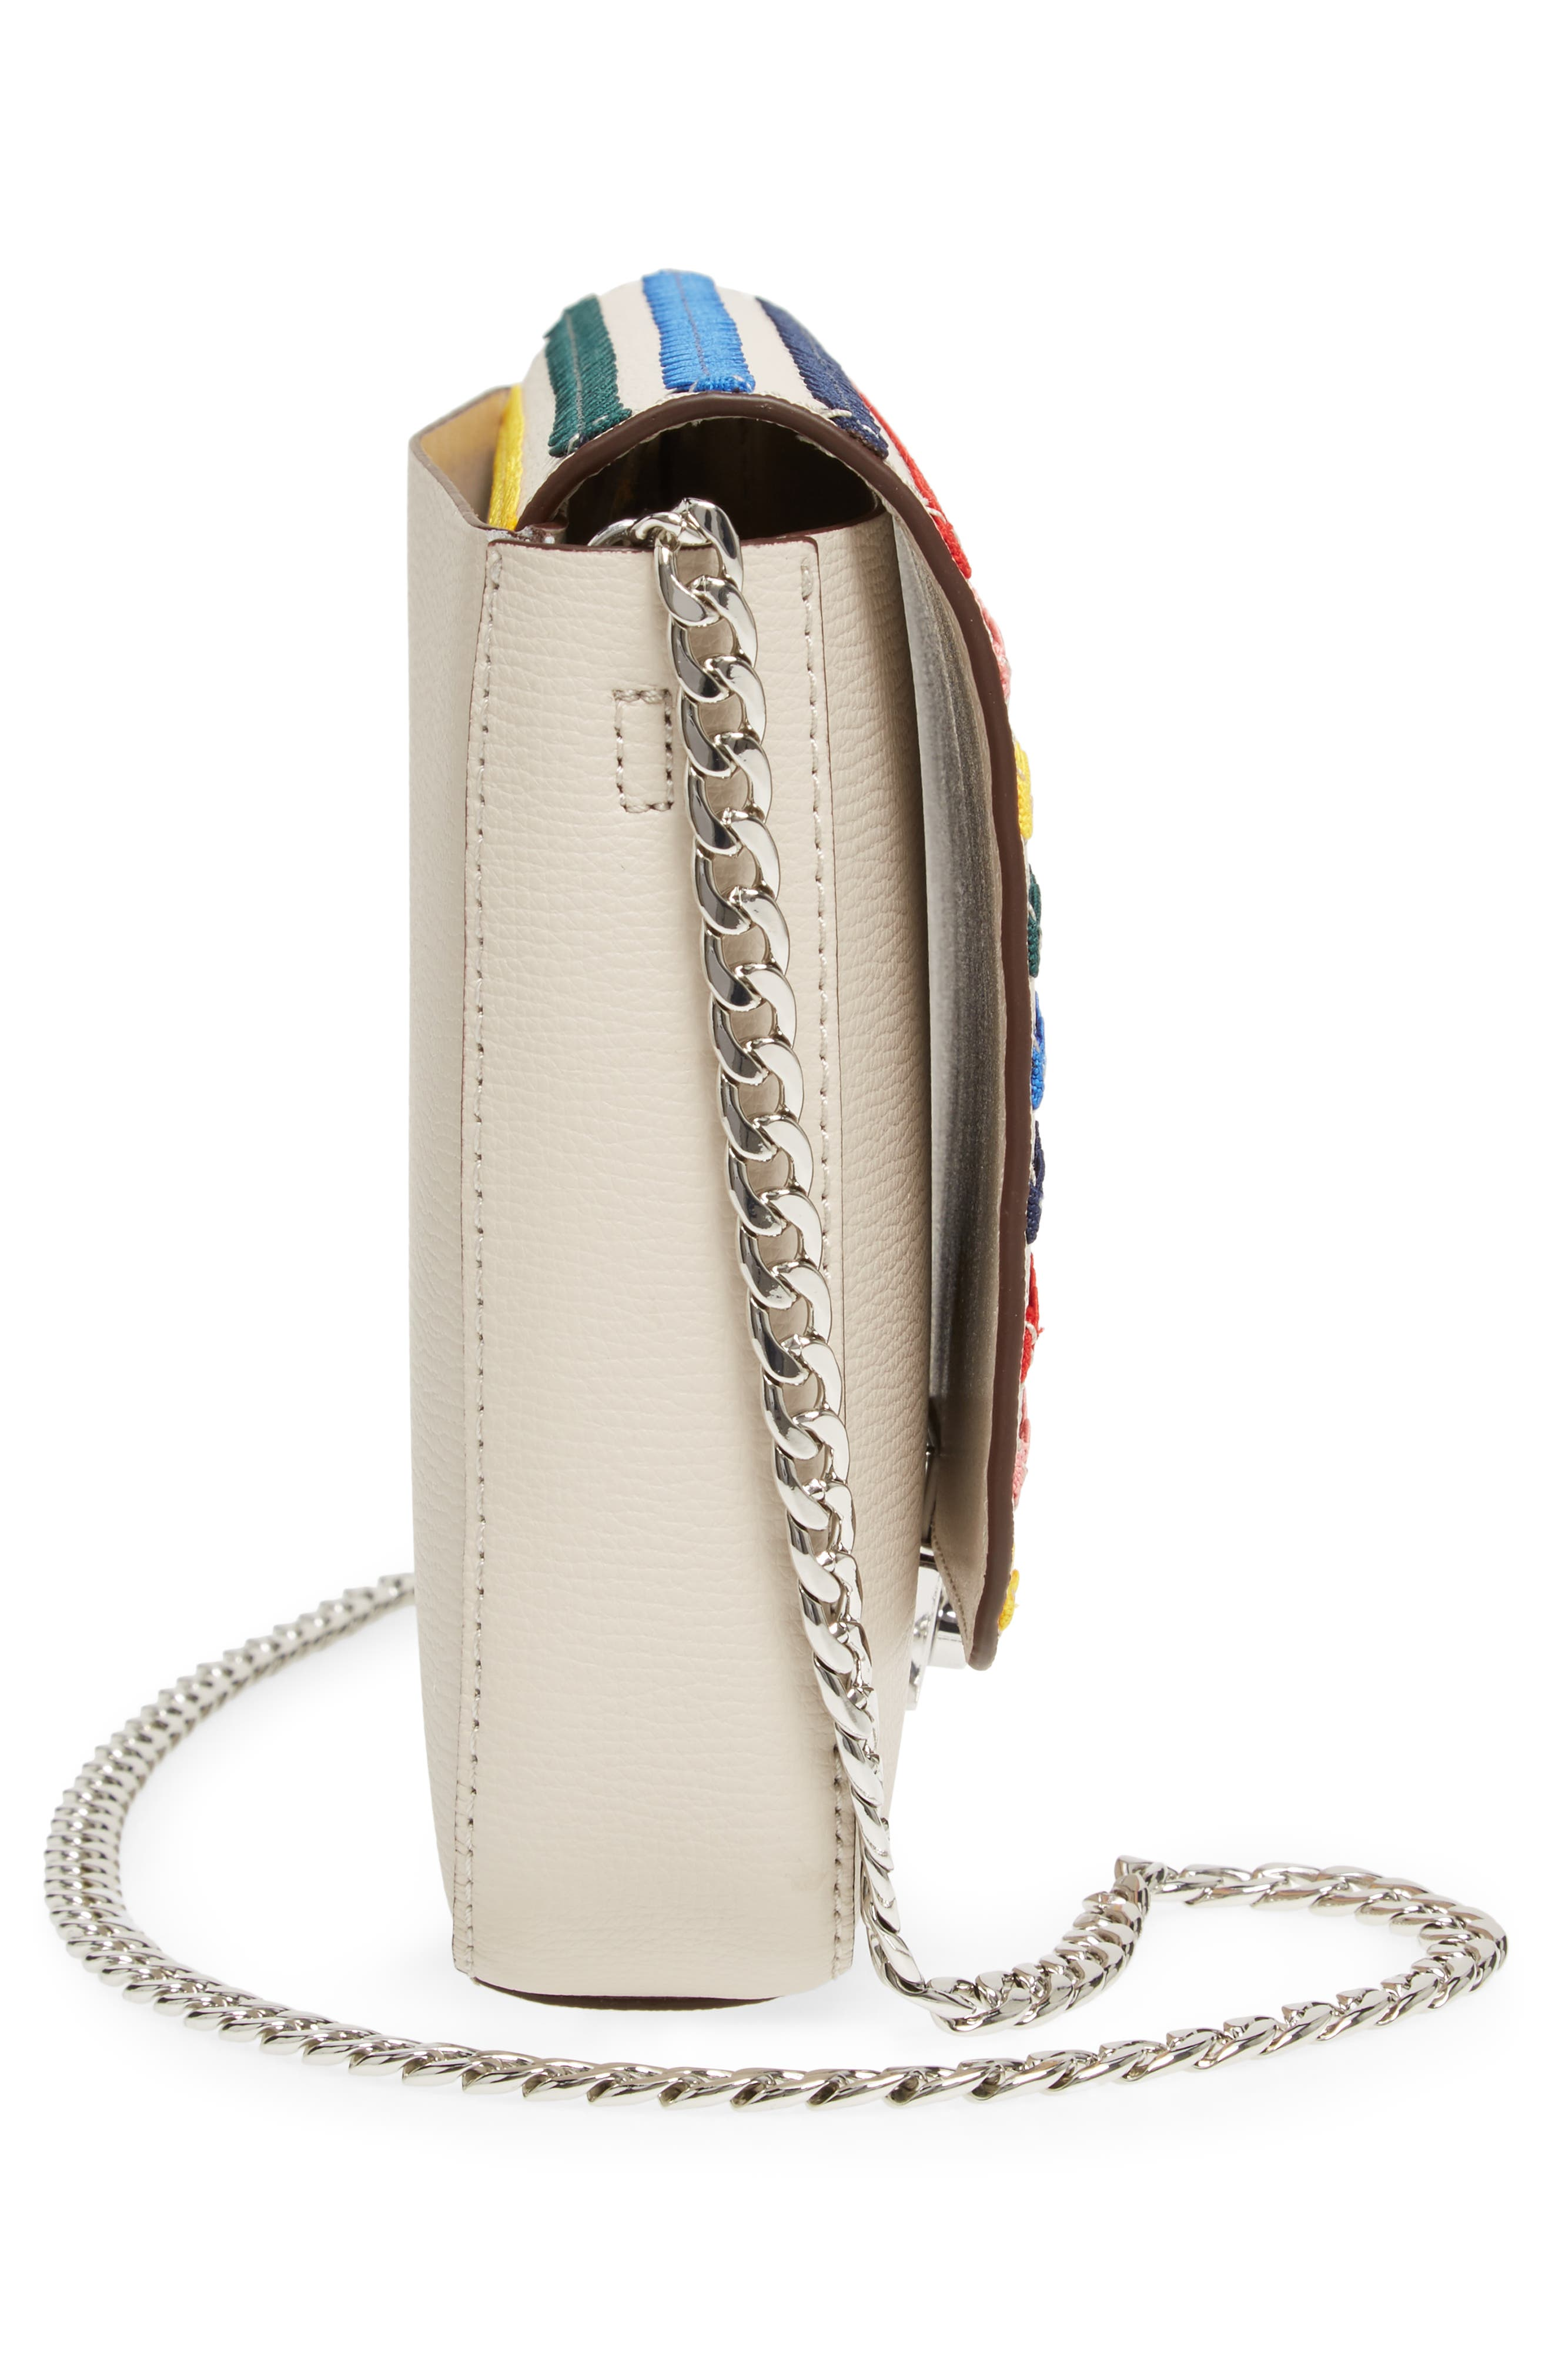 Lock Leather Flap Clutch/Shoulder Bag,                             Alternate thumbnail 5, color,                             030